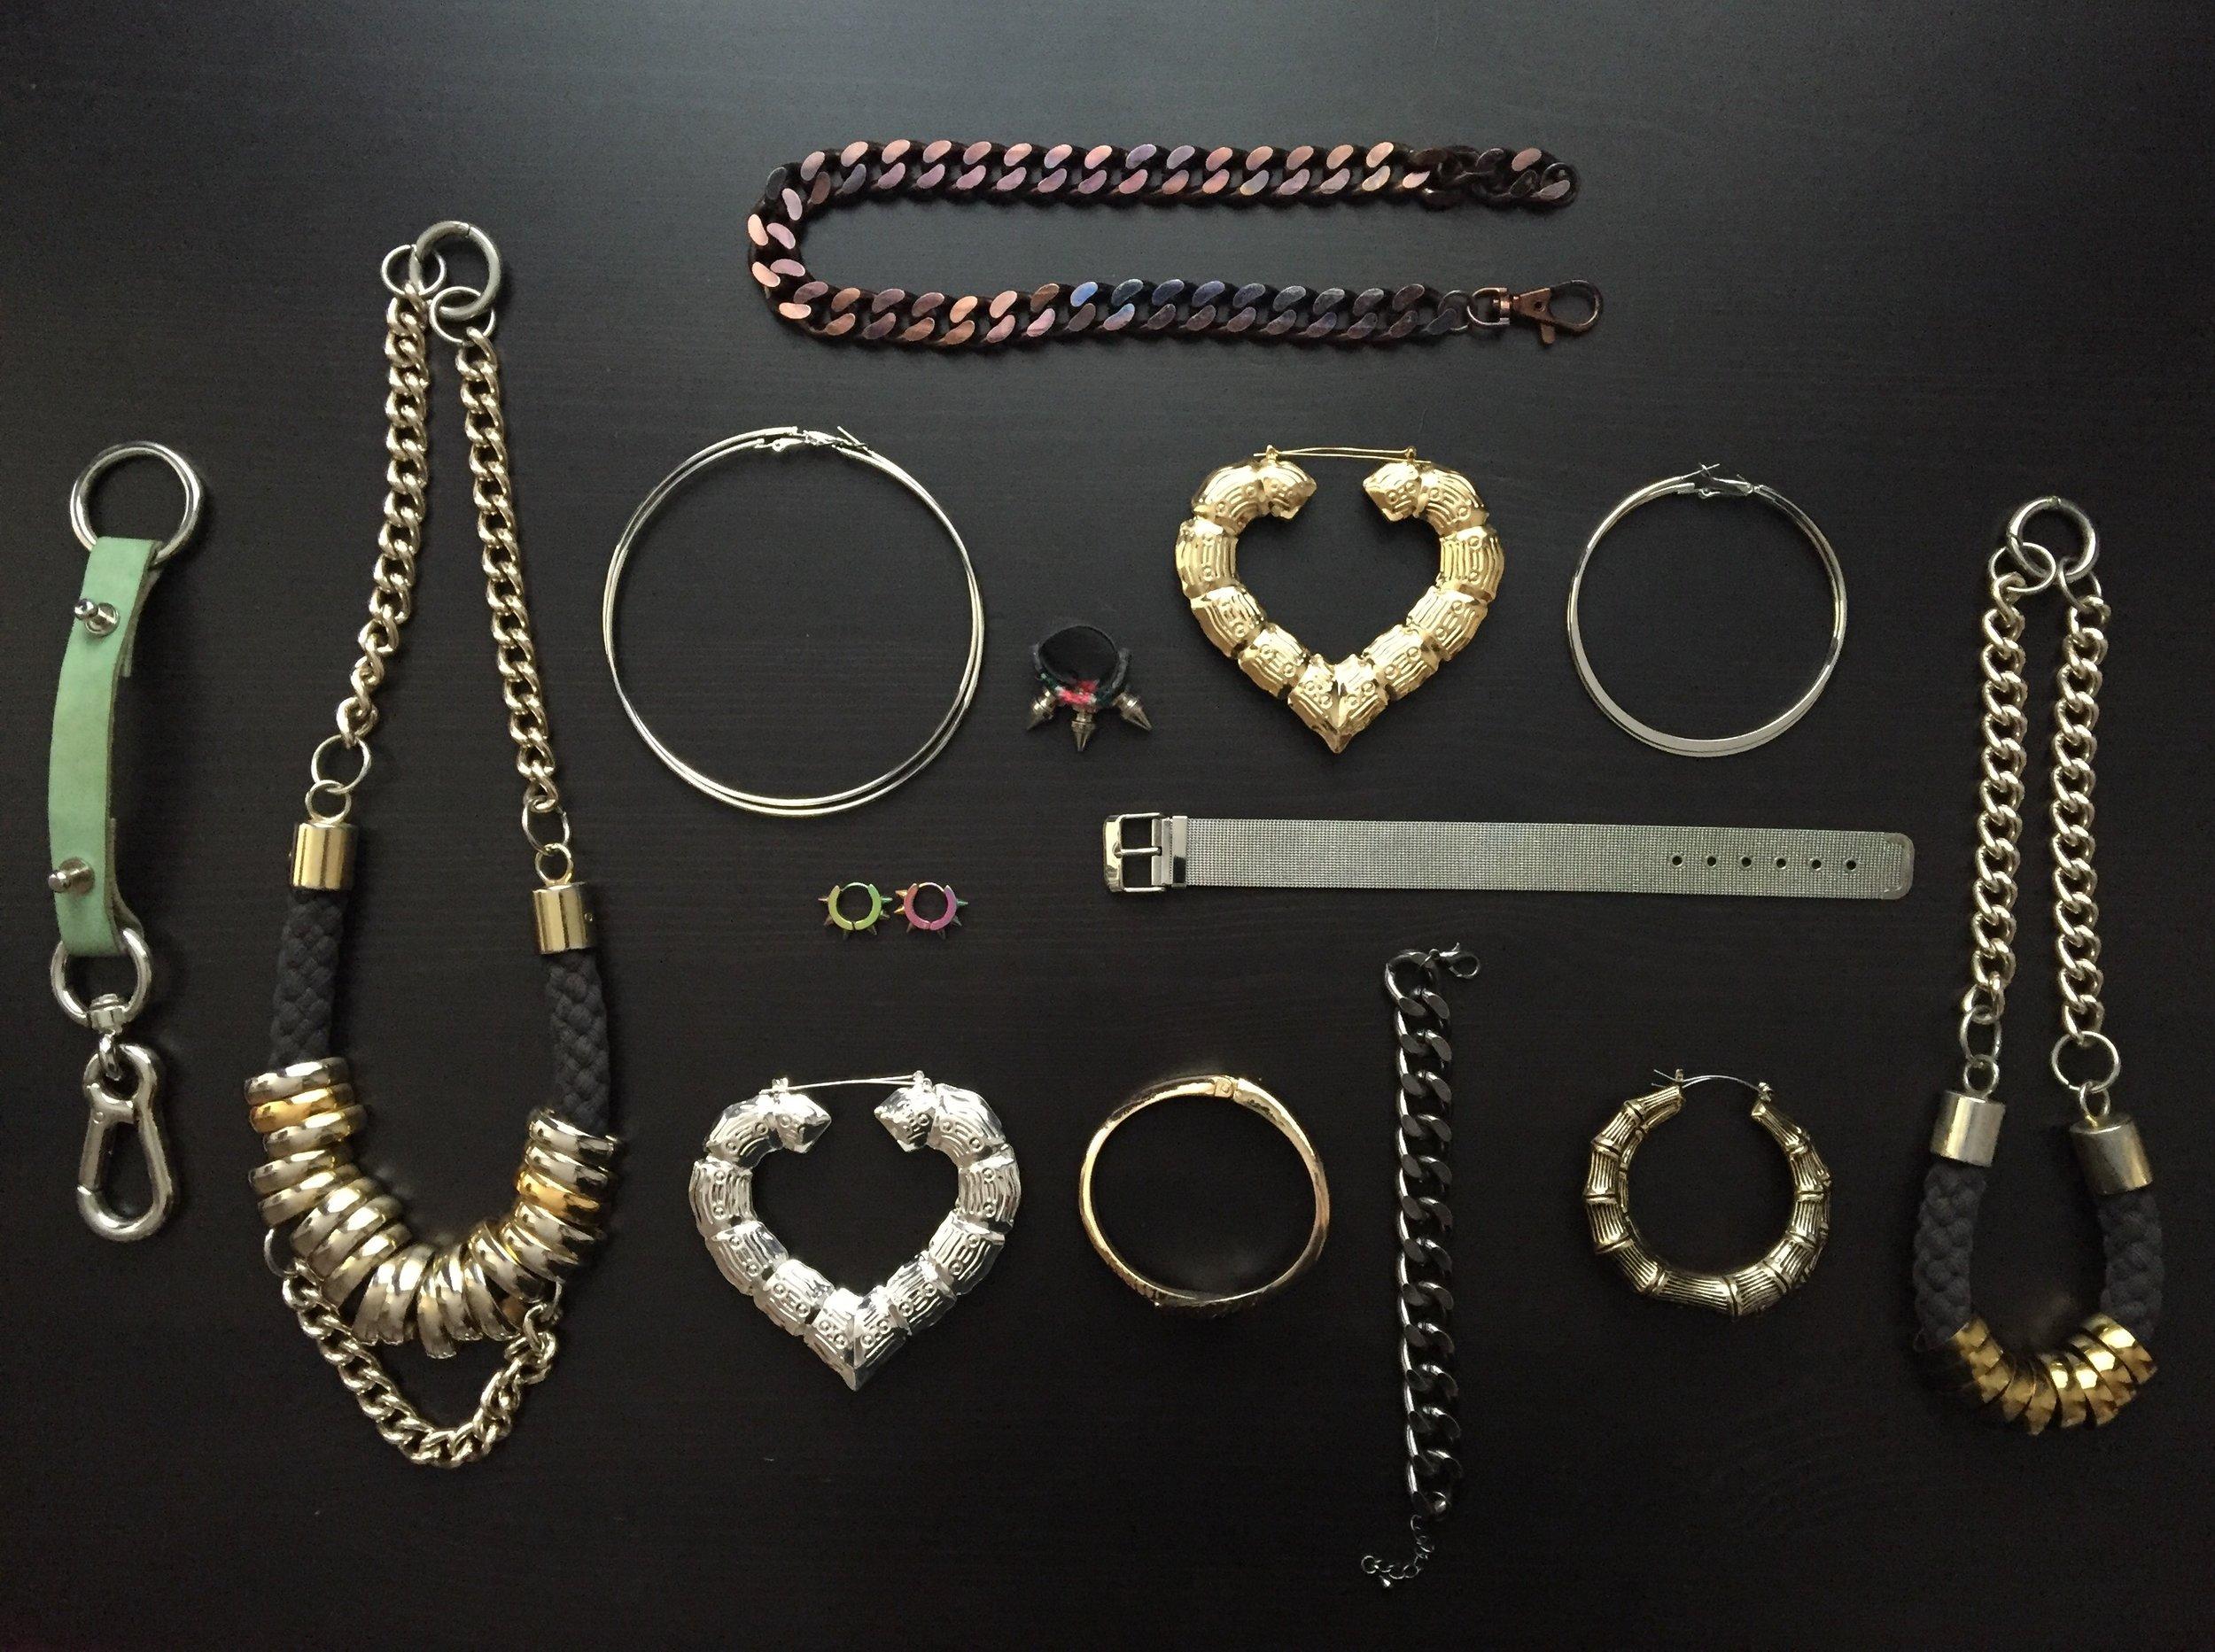 Jewellery options